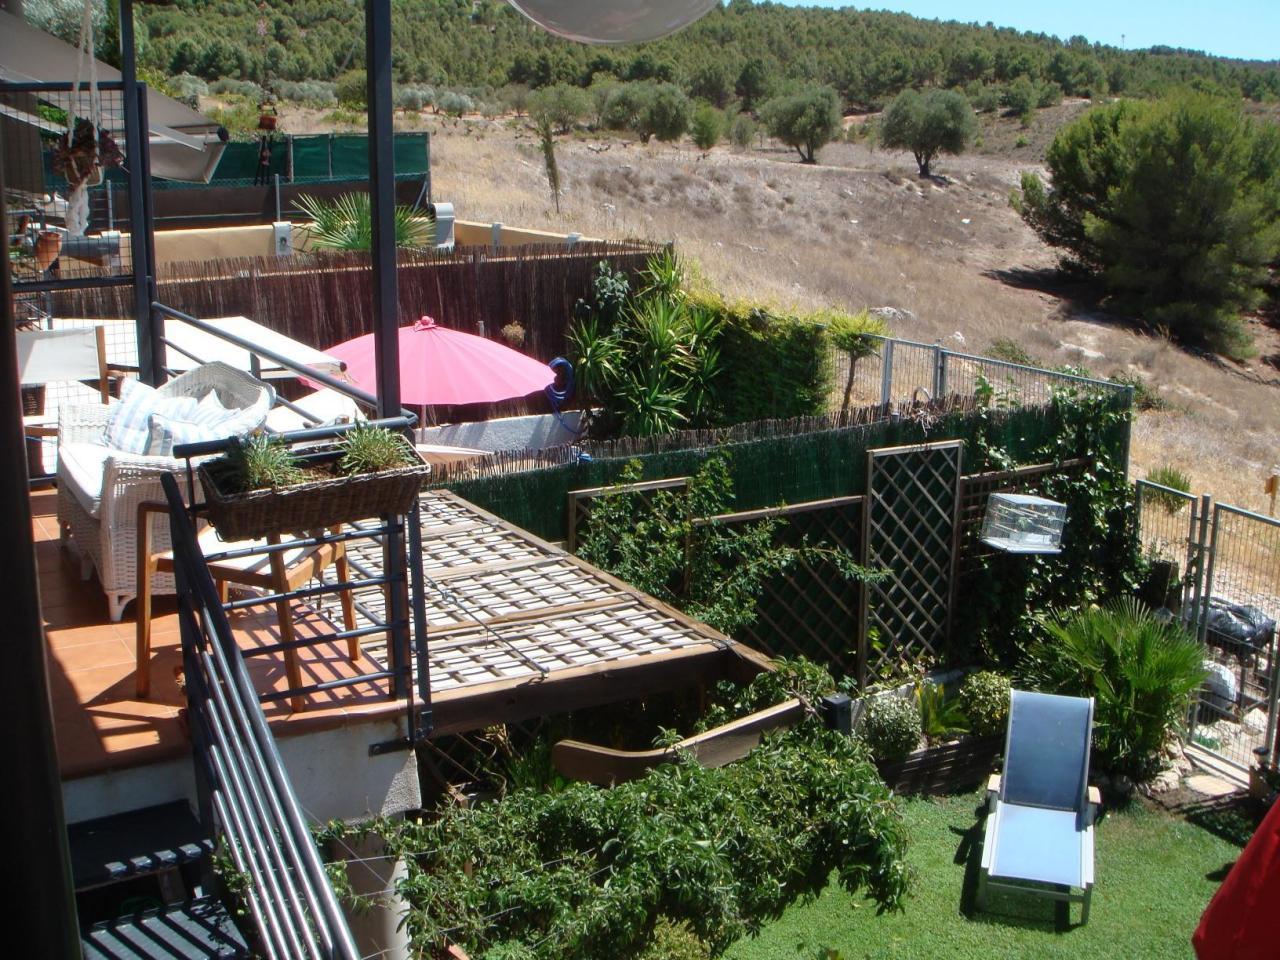 Townhouse Outdoor Patio Ideas : Spanish Backyard Townhouse 1  Outdoor Patio Blog  CozyDays